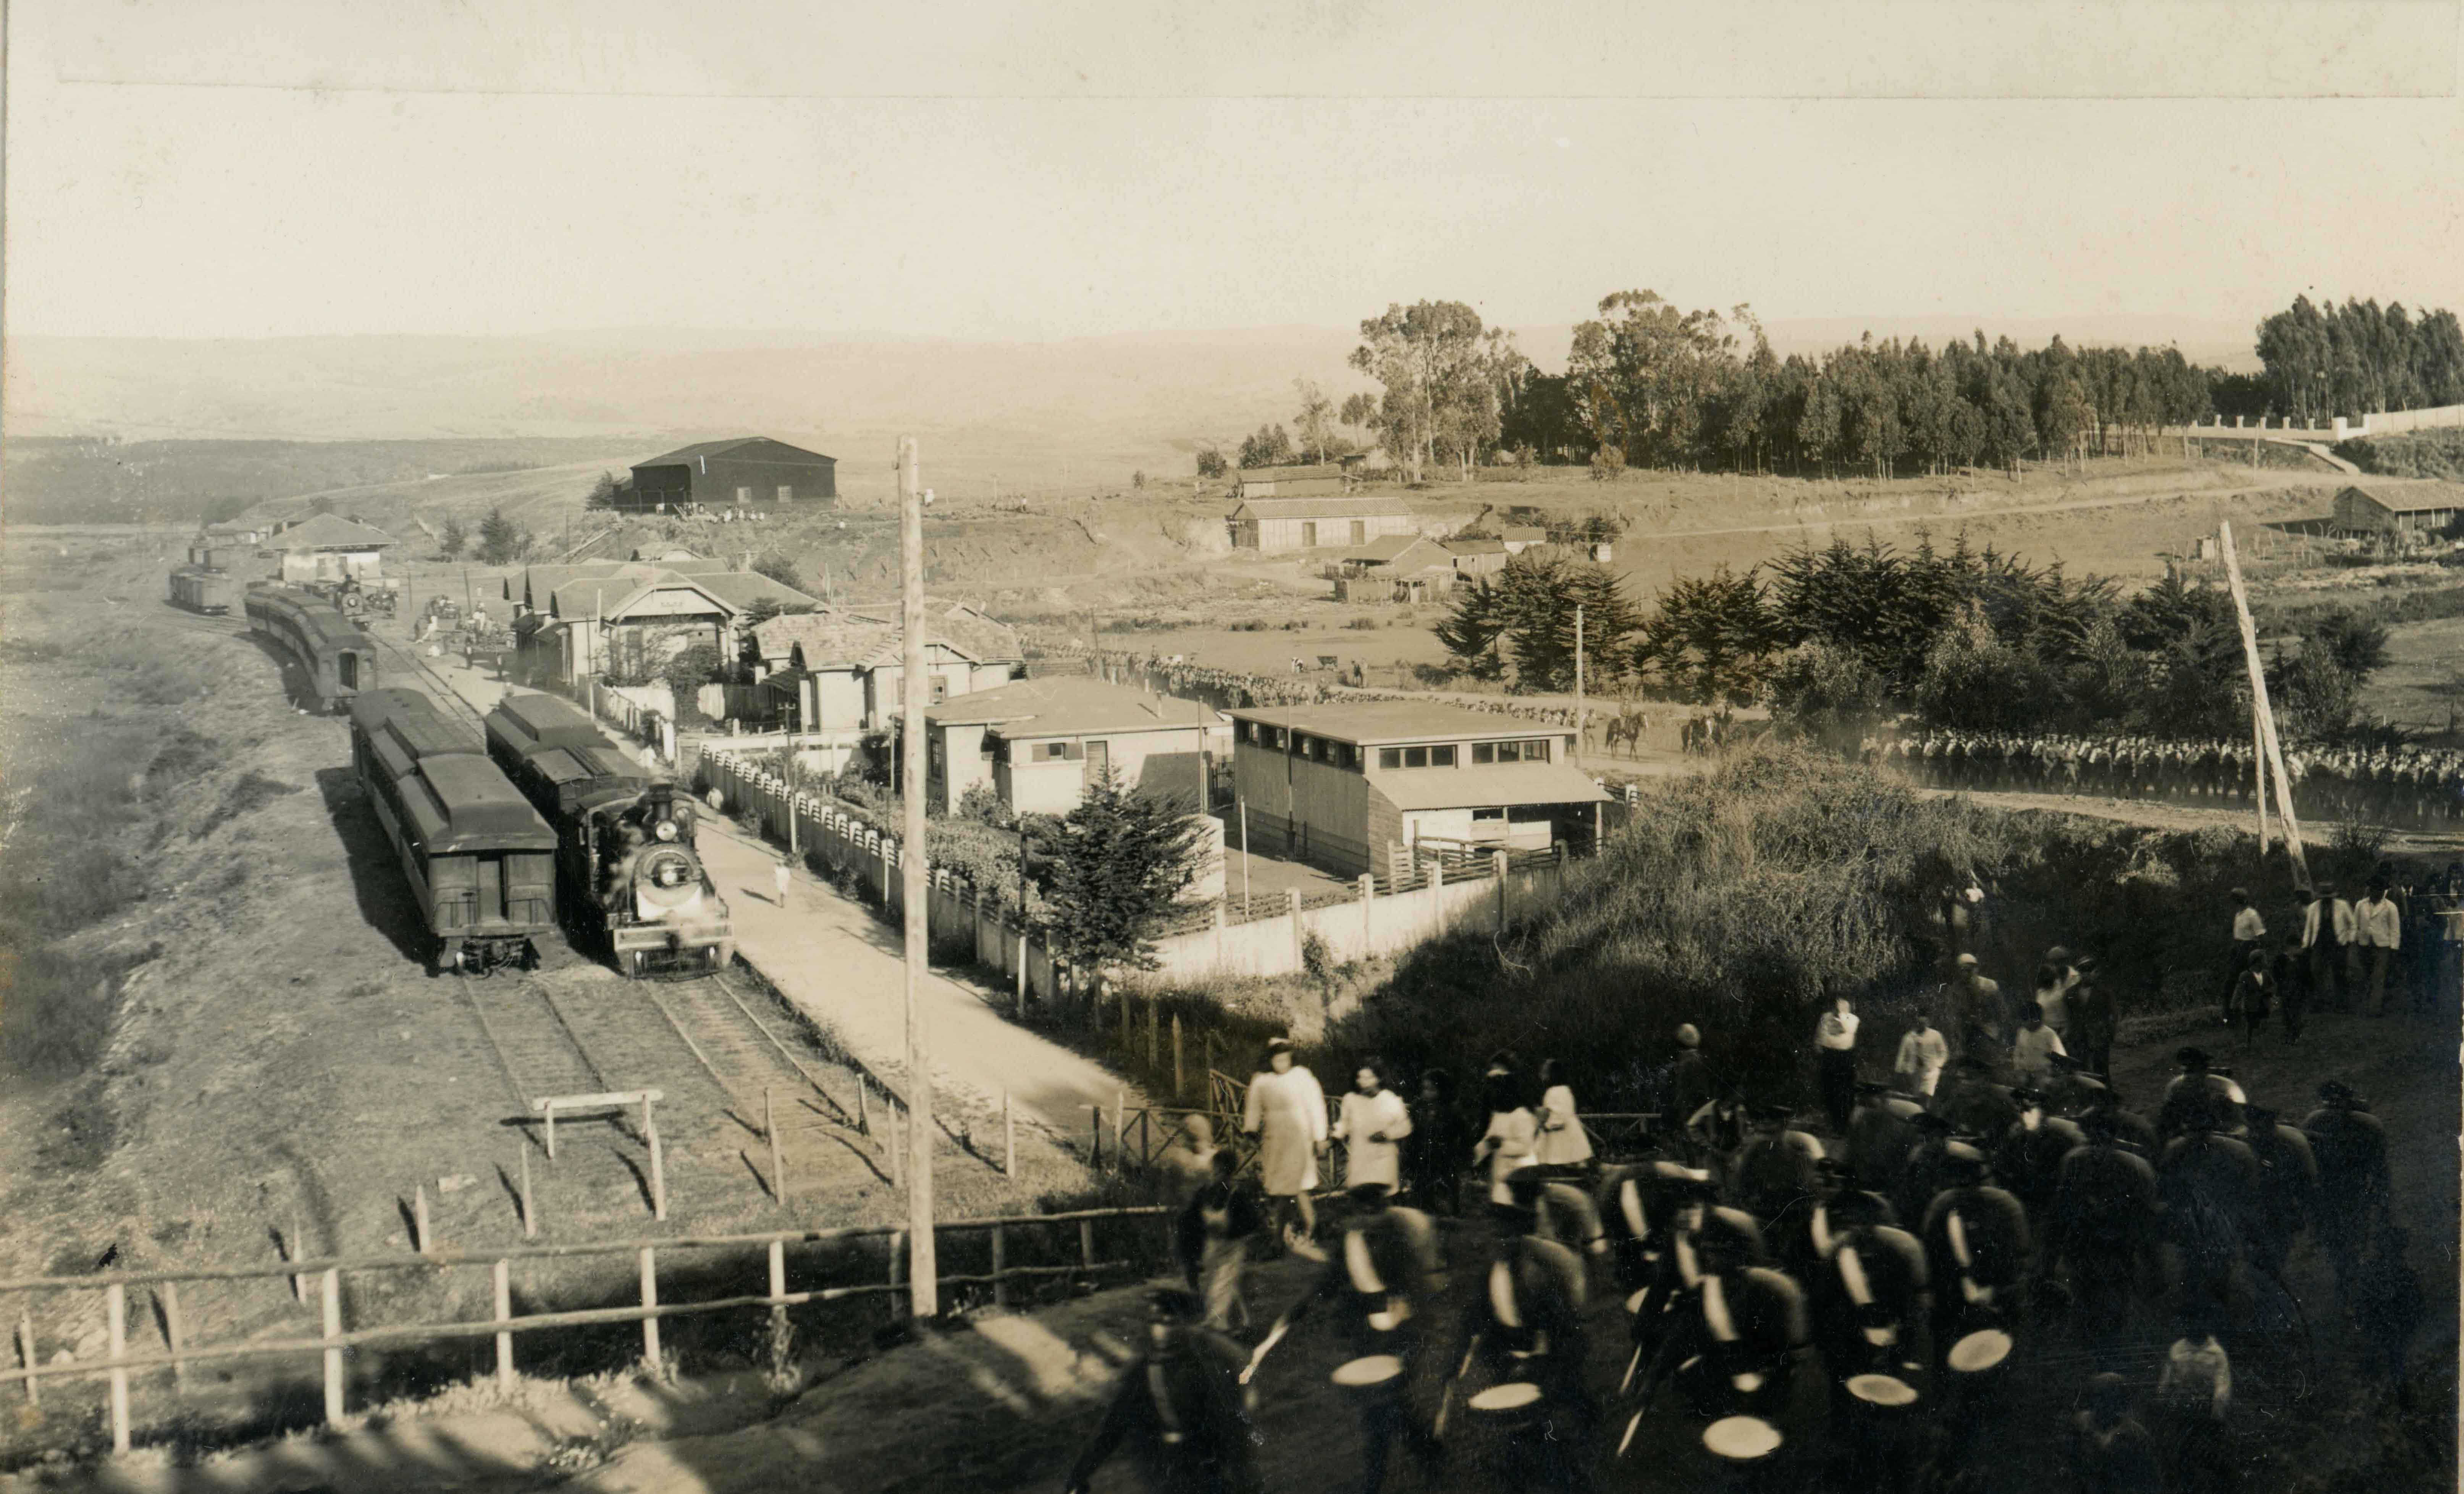 Enterreno - Fotos históricas de chile - fotos antiguas de Chile - Campaña de cadetes en Pichilemu, 1944